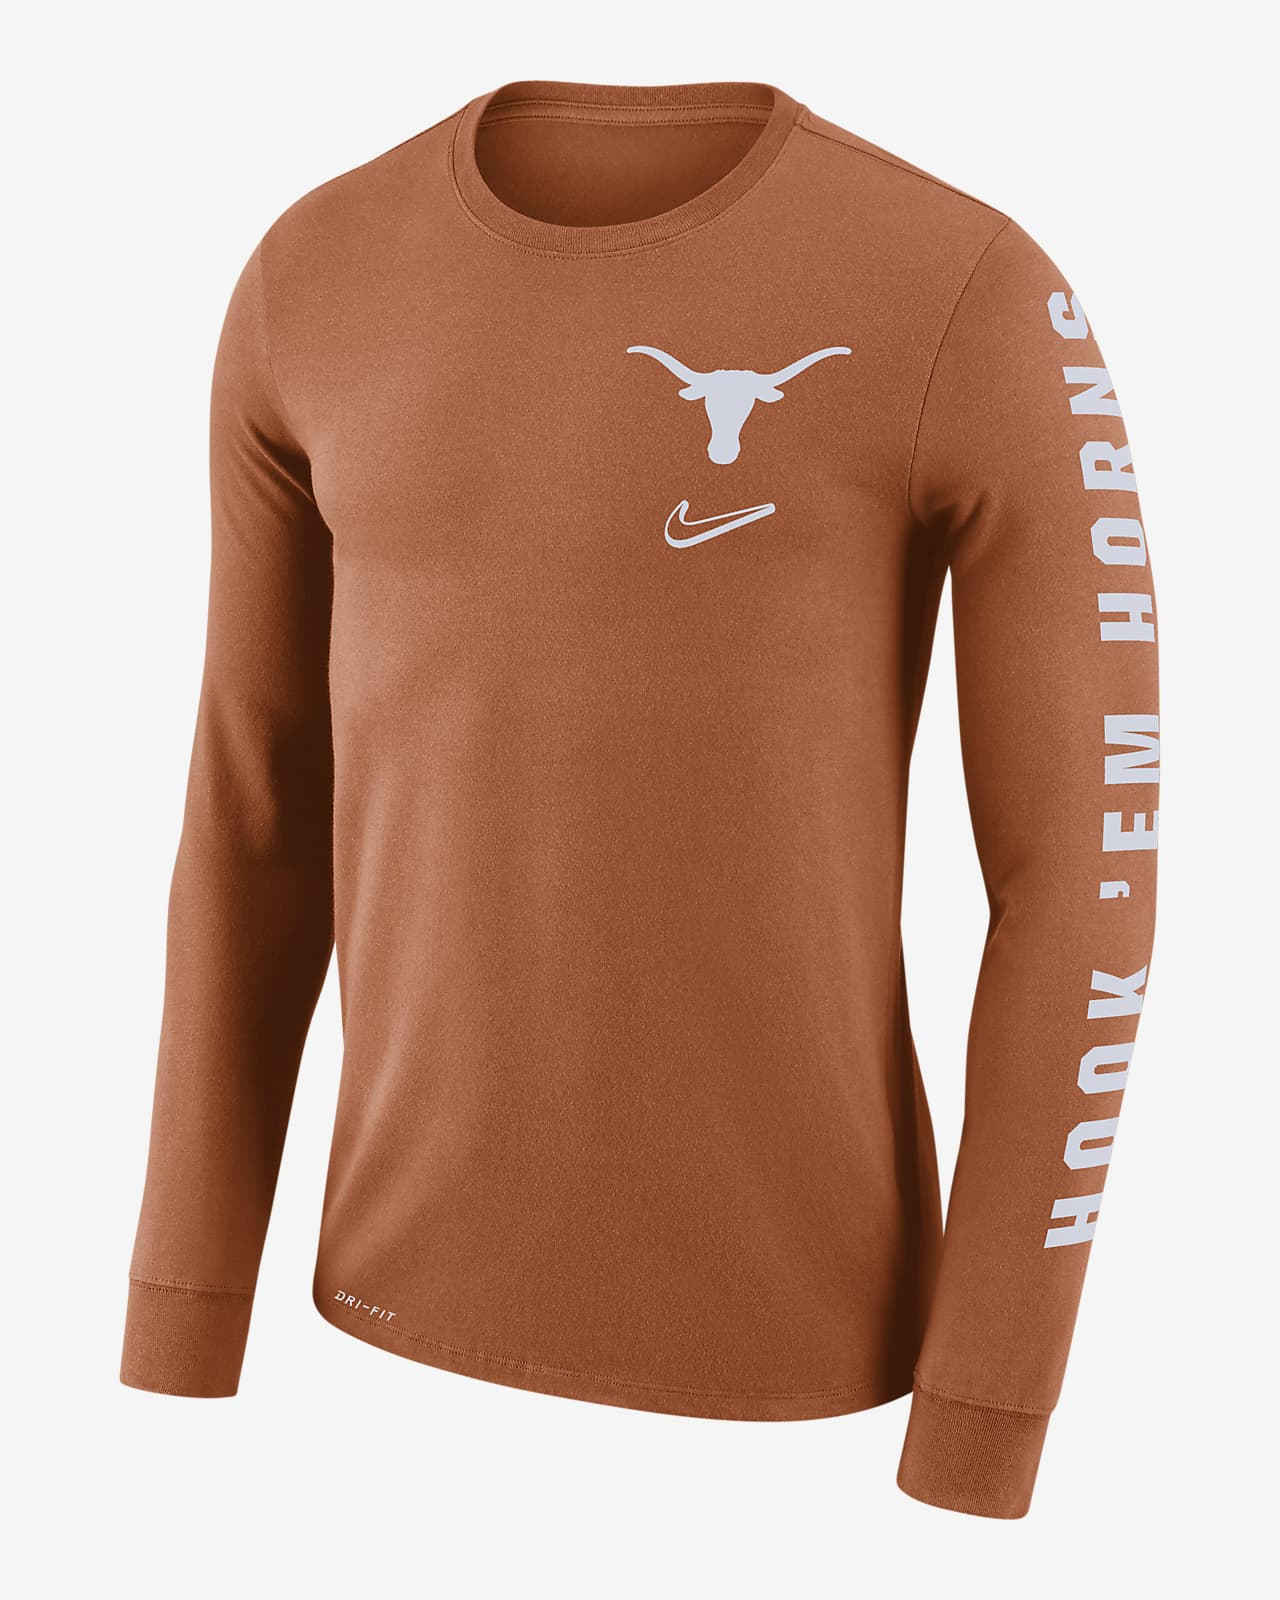 abdomen Intacto mordedura  Nike College Dri-FIT Mantra (Texas) Men's Long-Sleeve T-Shirt. Nike.com